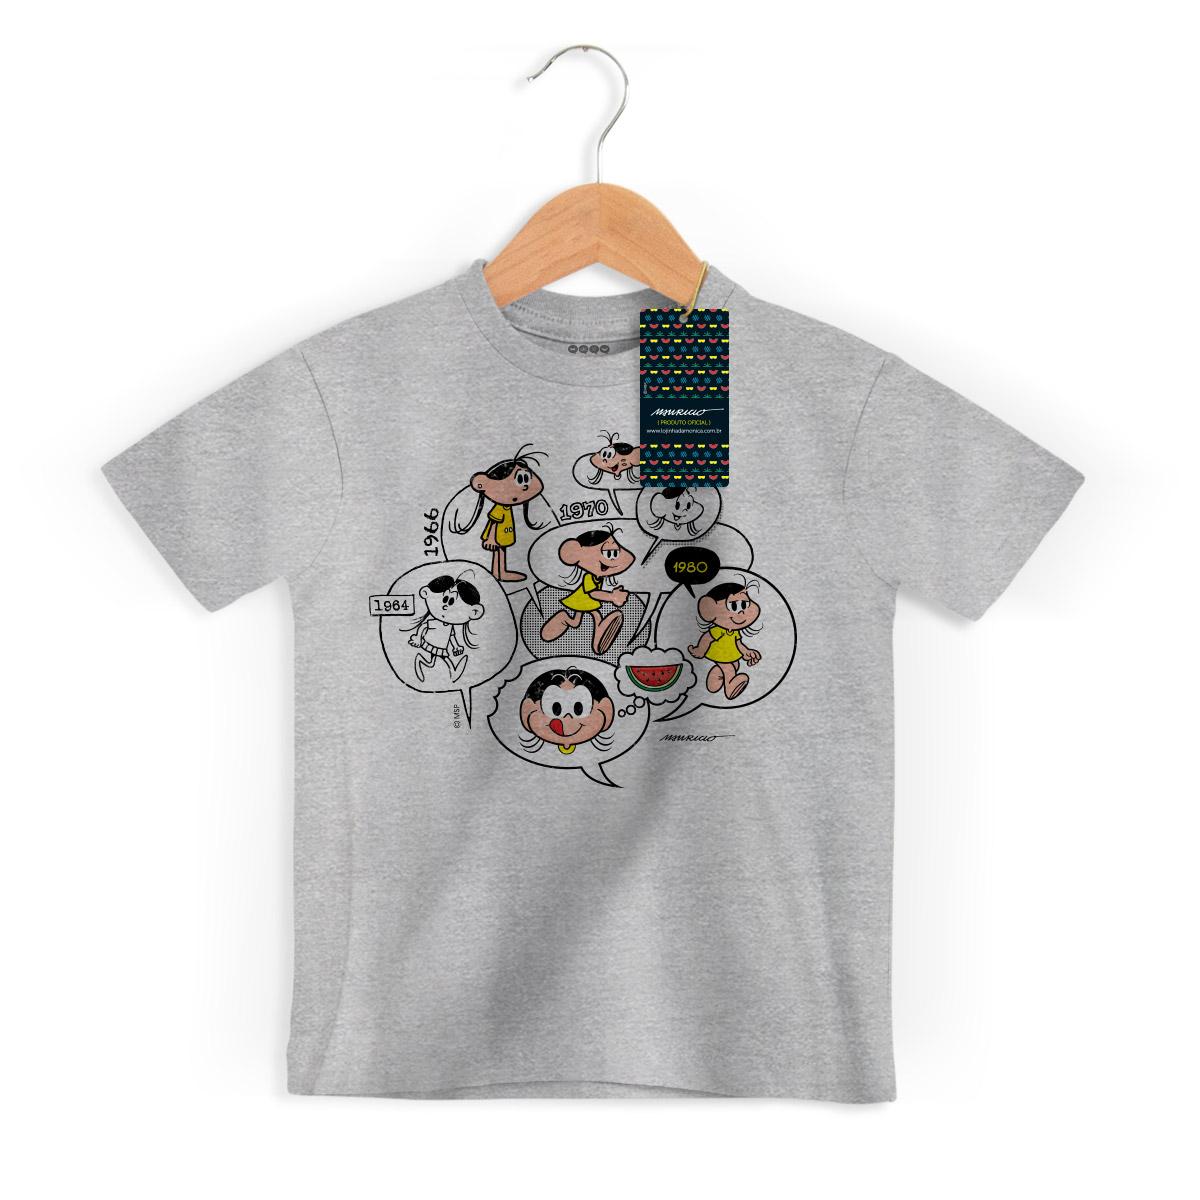 Camiseta Infanto Juvenil Magali 50 Anos Since 1964